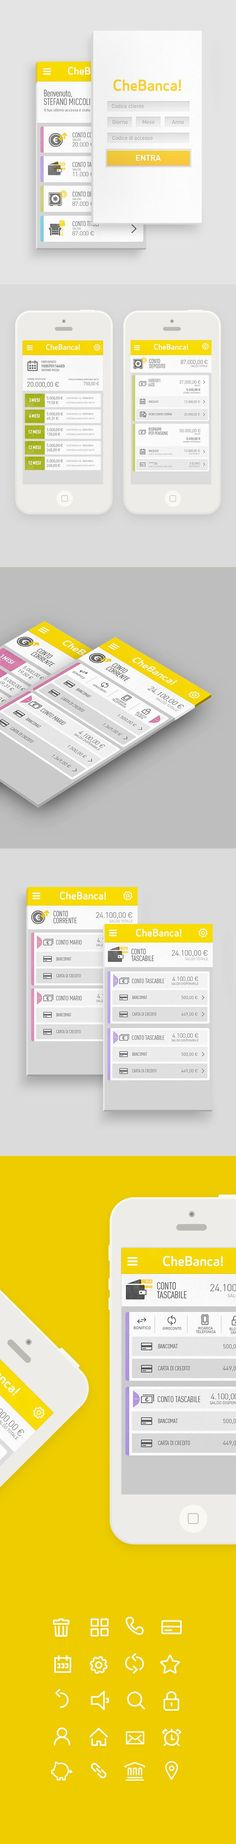 Banking App by LUMEN BIGOTT, via Behance